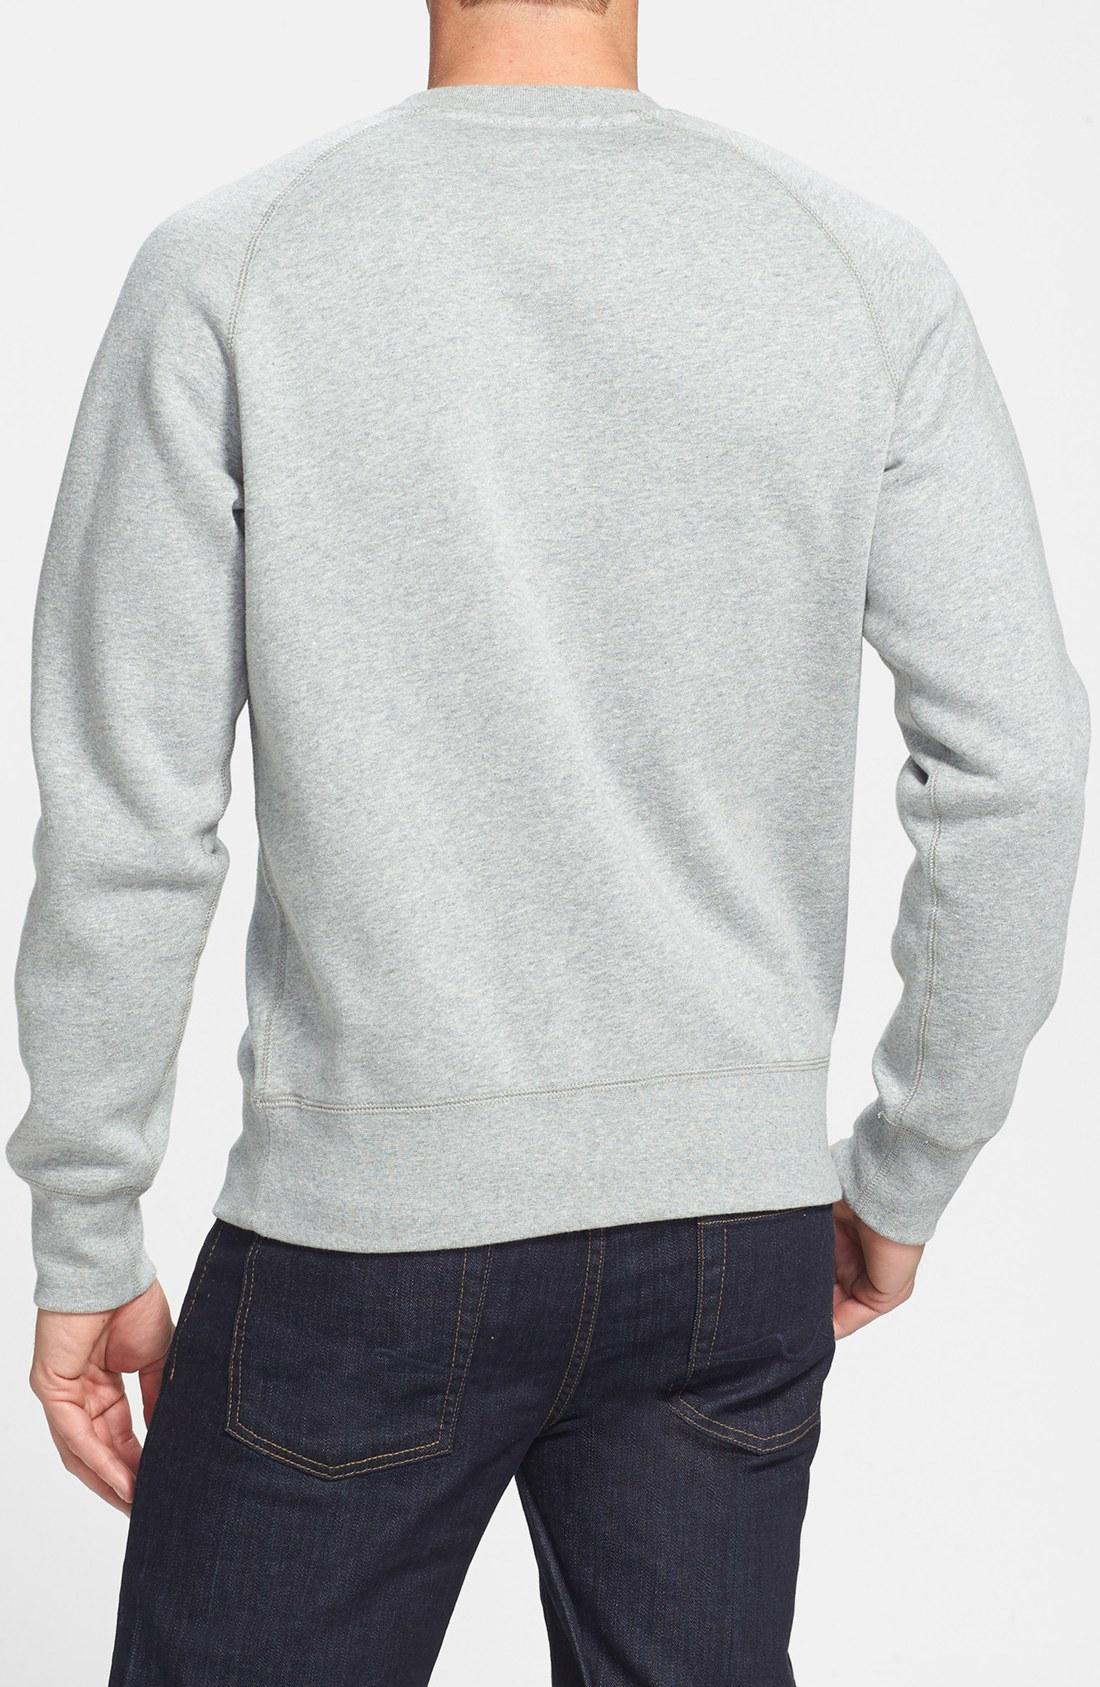 nike aw77 crewneck sweatshirt in gray for men lyst. Black Bedroom Furniture Sets. Home Design Ideas